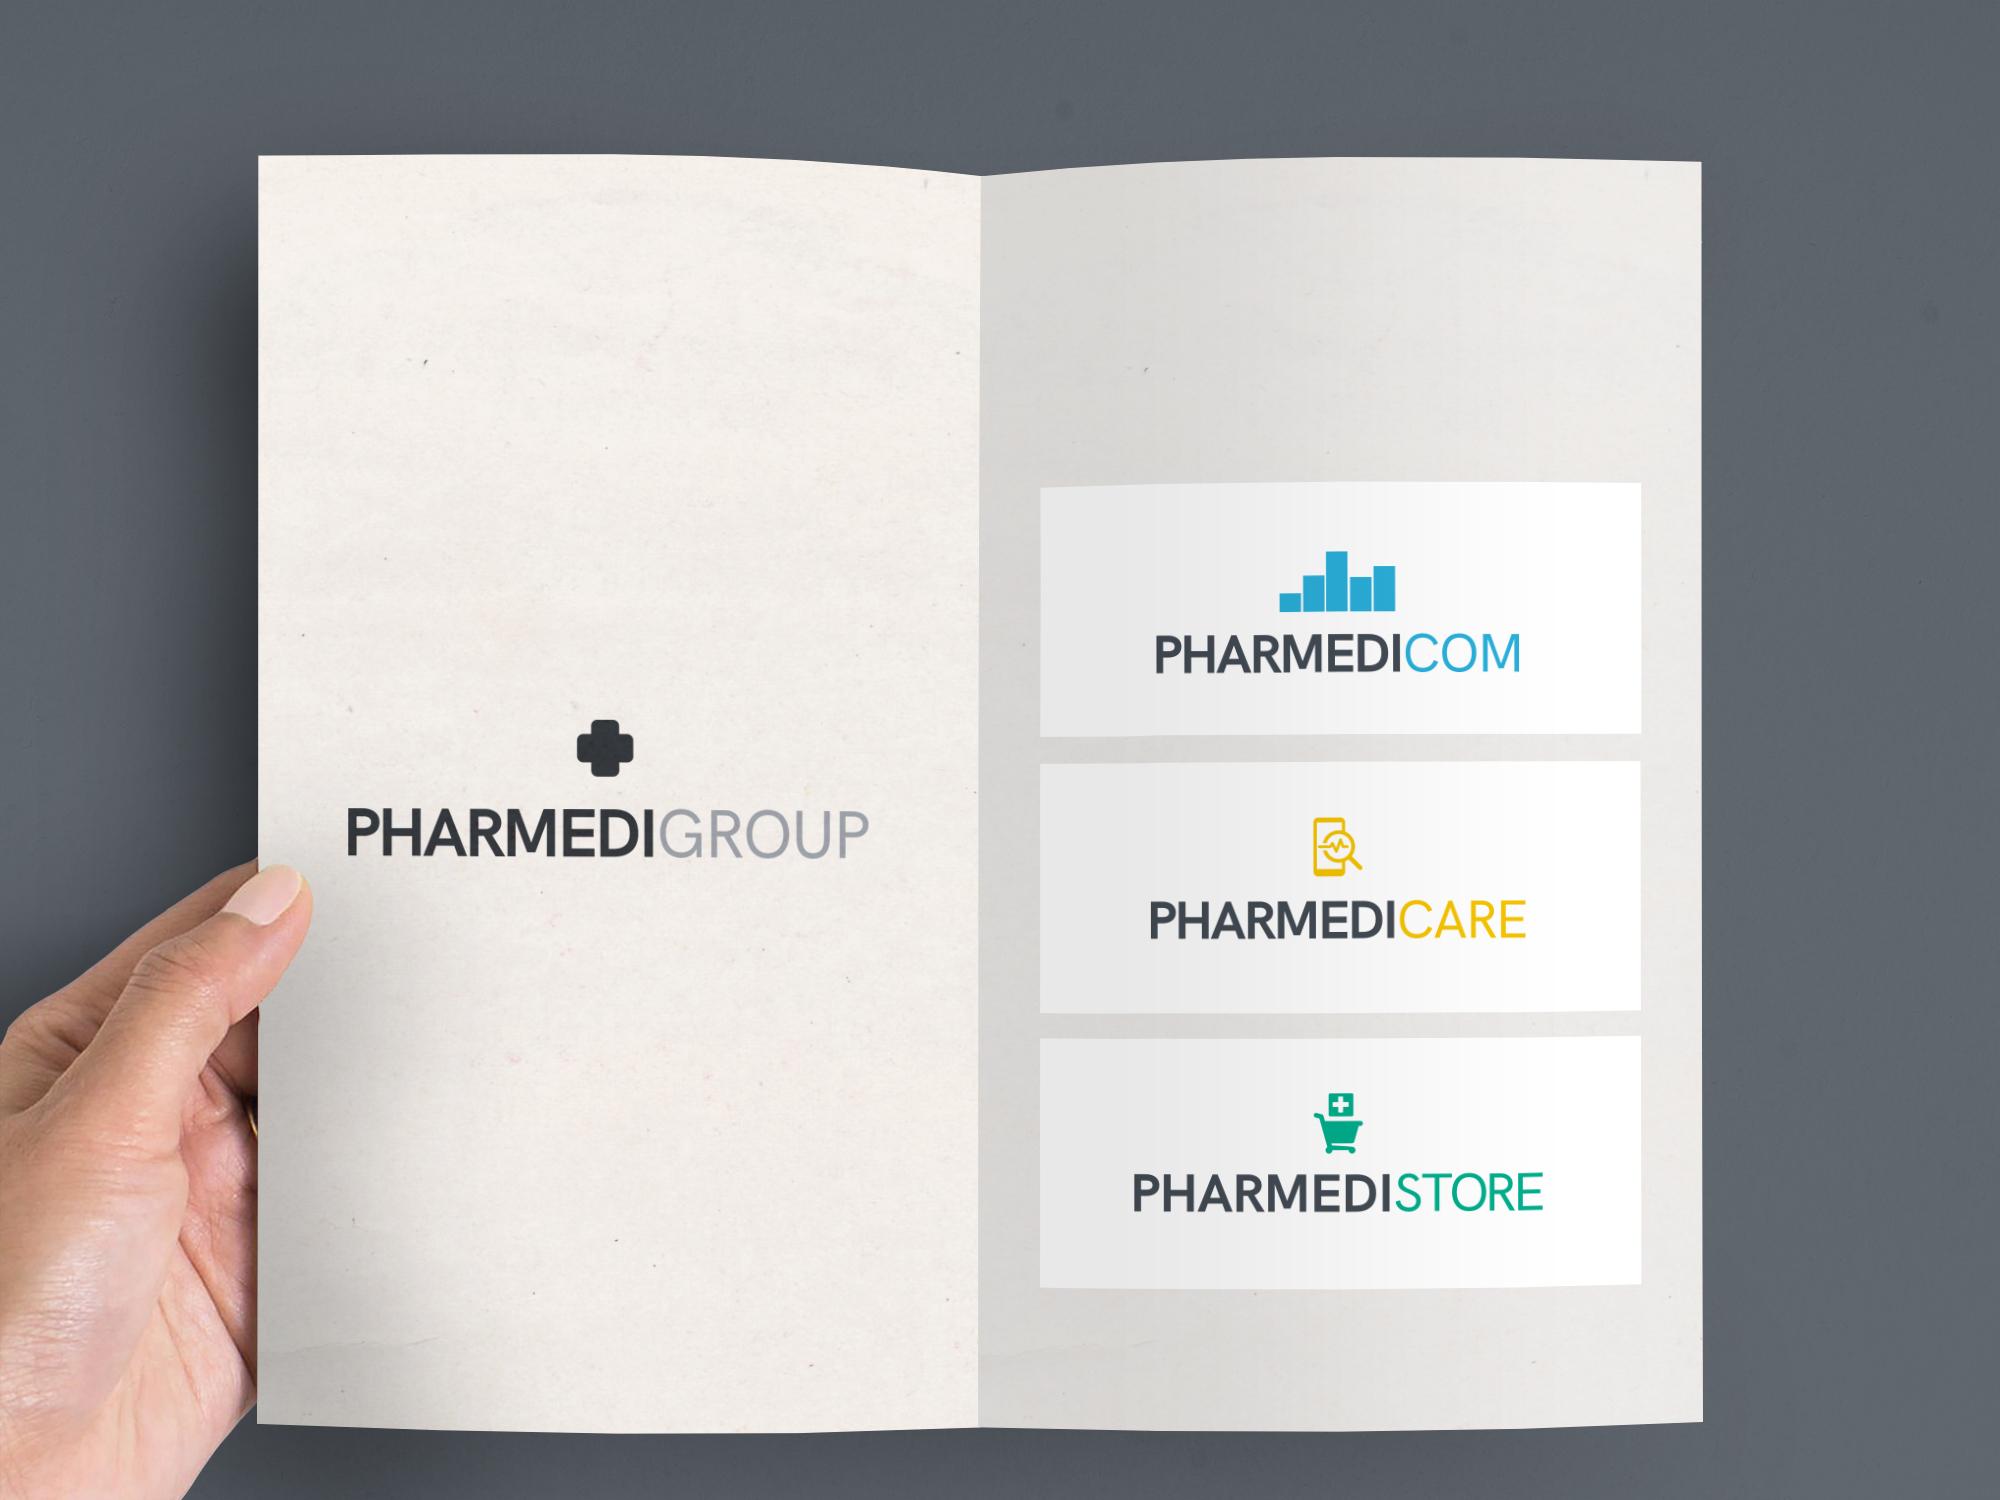 Création des marques Pharmédigroup, Pharmédicom, Pharmédicare et Pharmédistore.